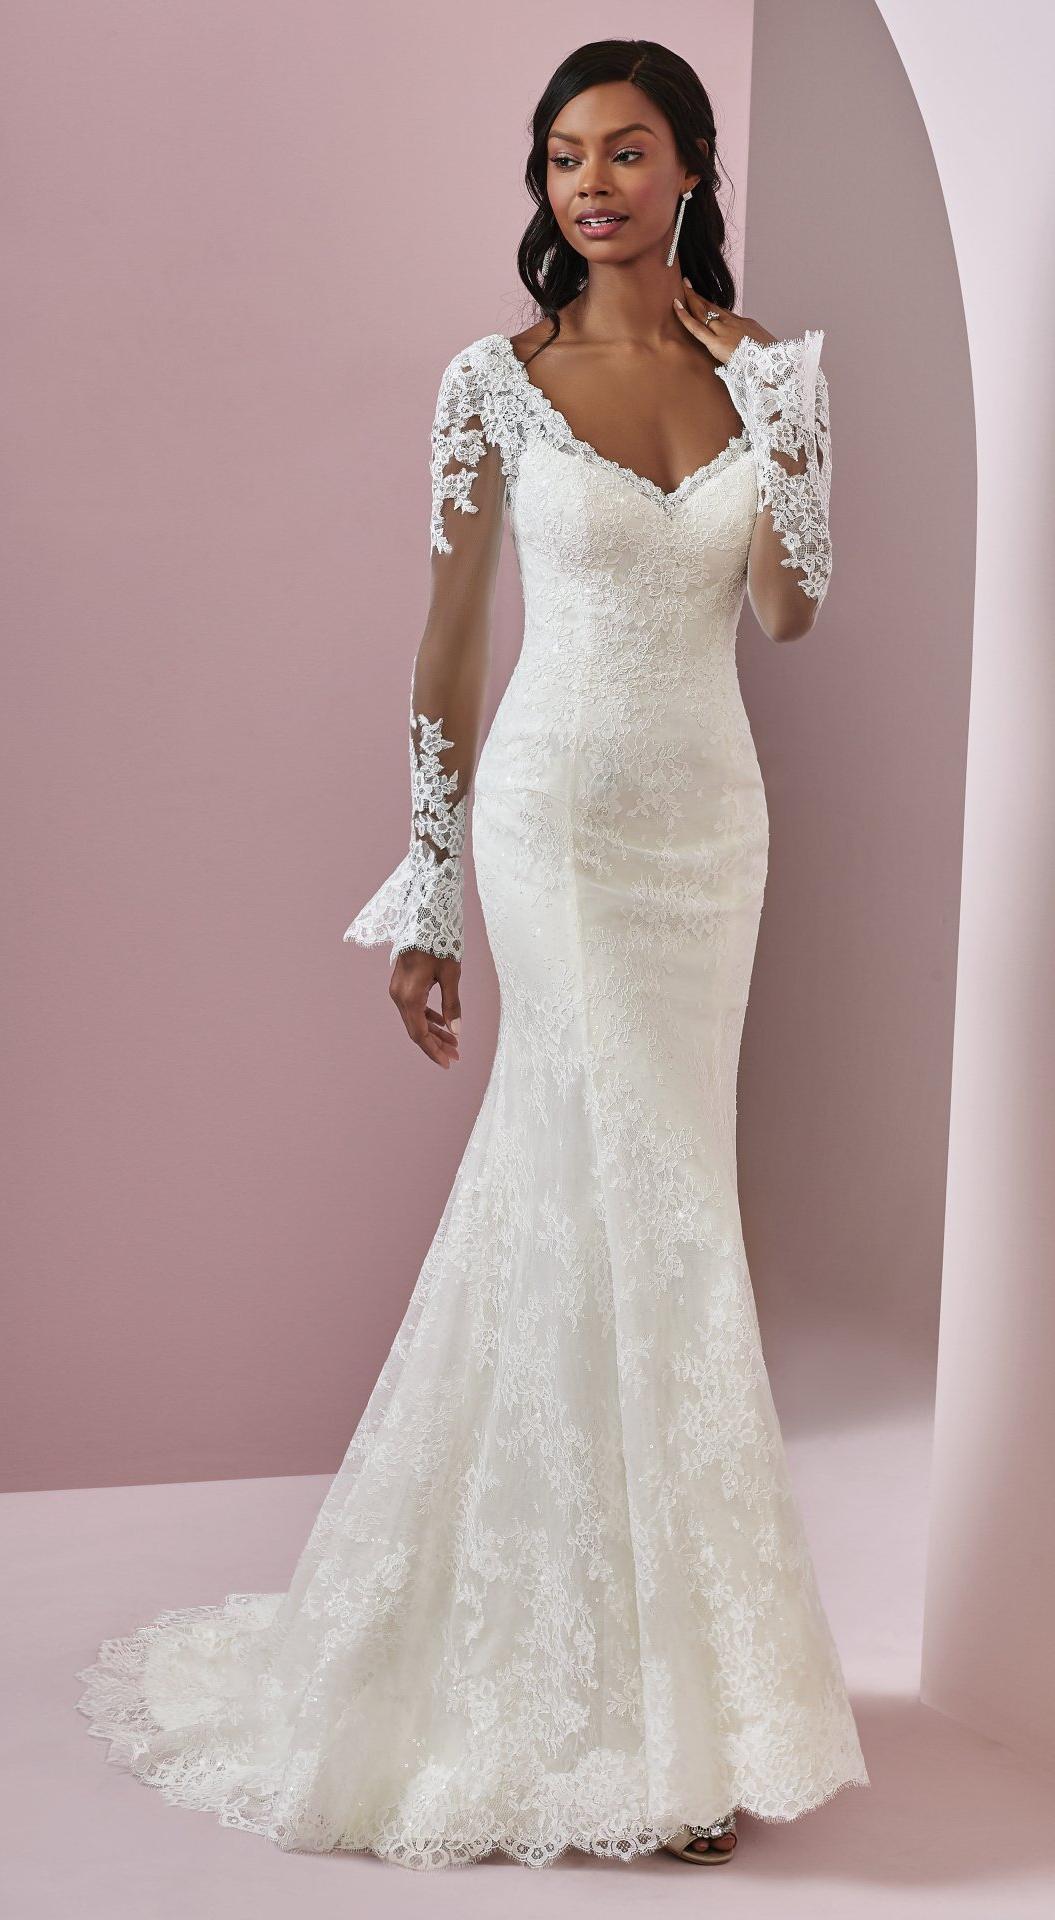 Lace dress bell sleeves june 2019 BONNIE by Rebecca Ingram Wedding Dresses  Unique  Pinterest